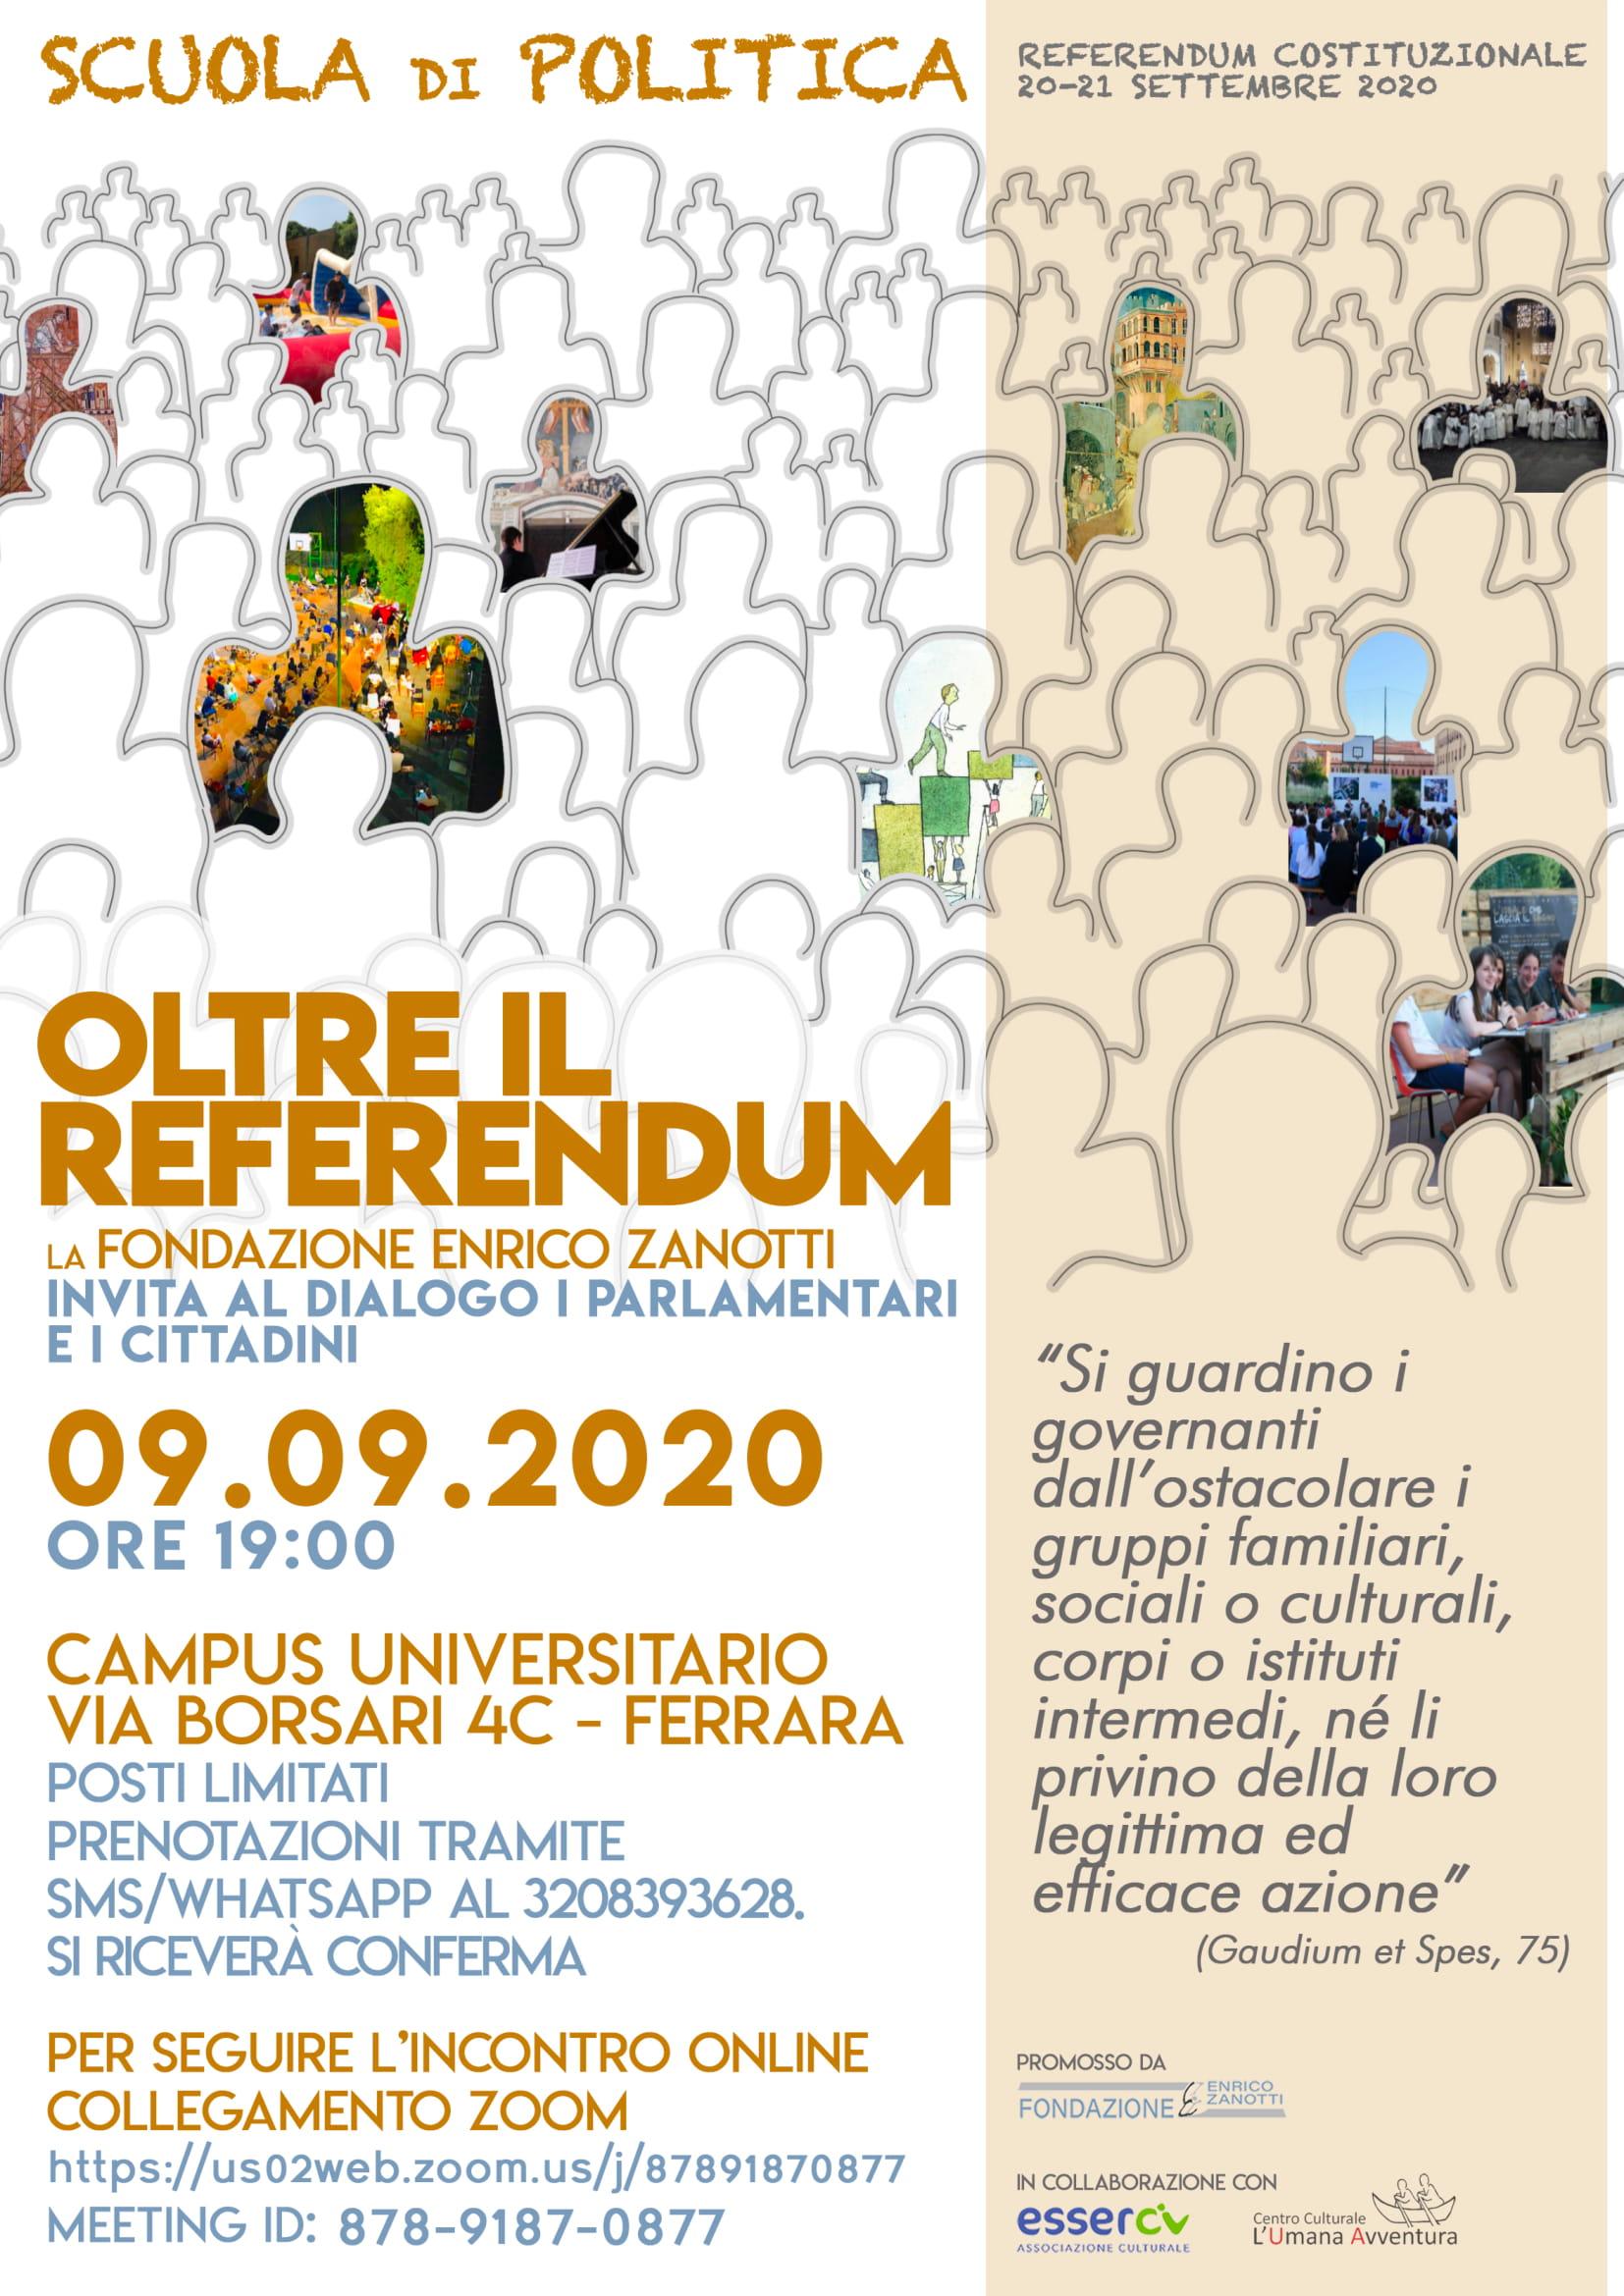 Volantino Referendum 09.09.2020-1